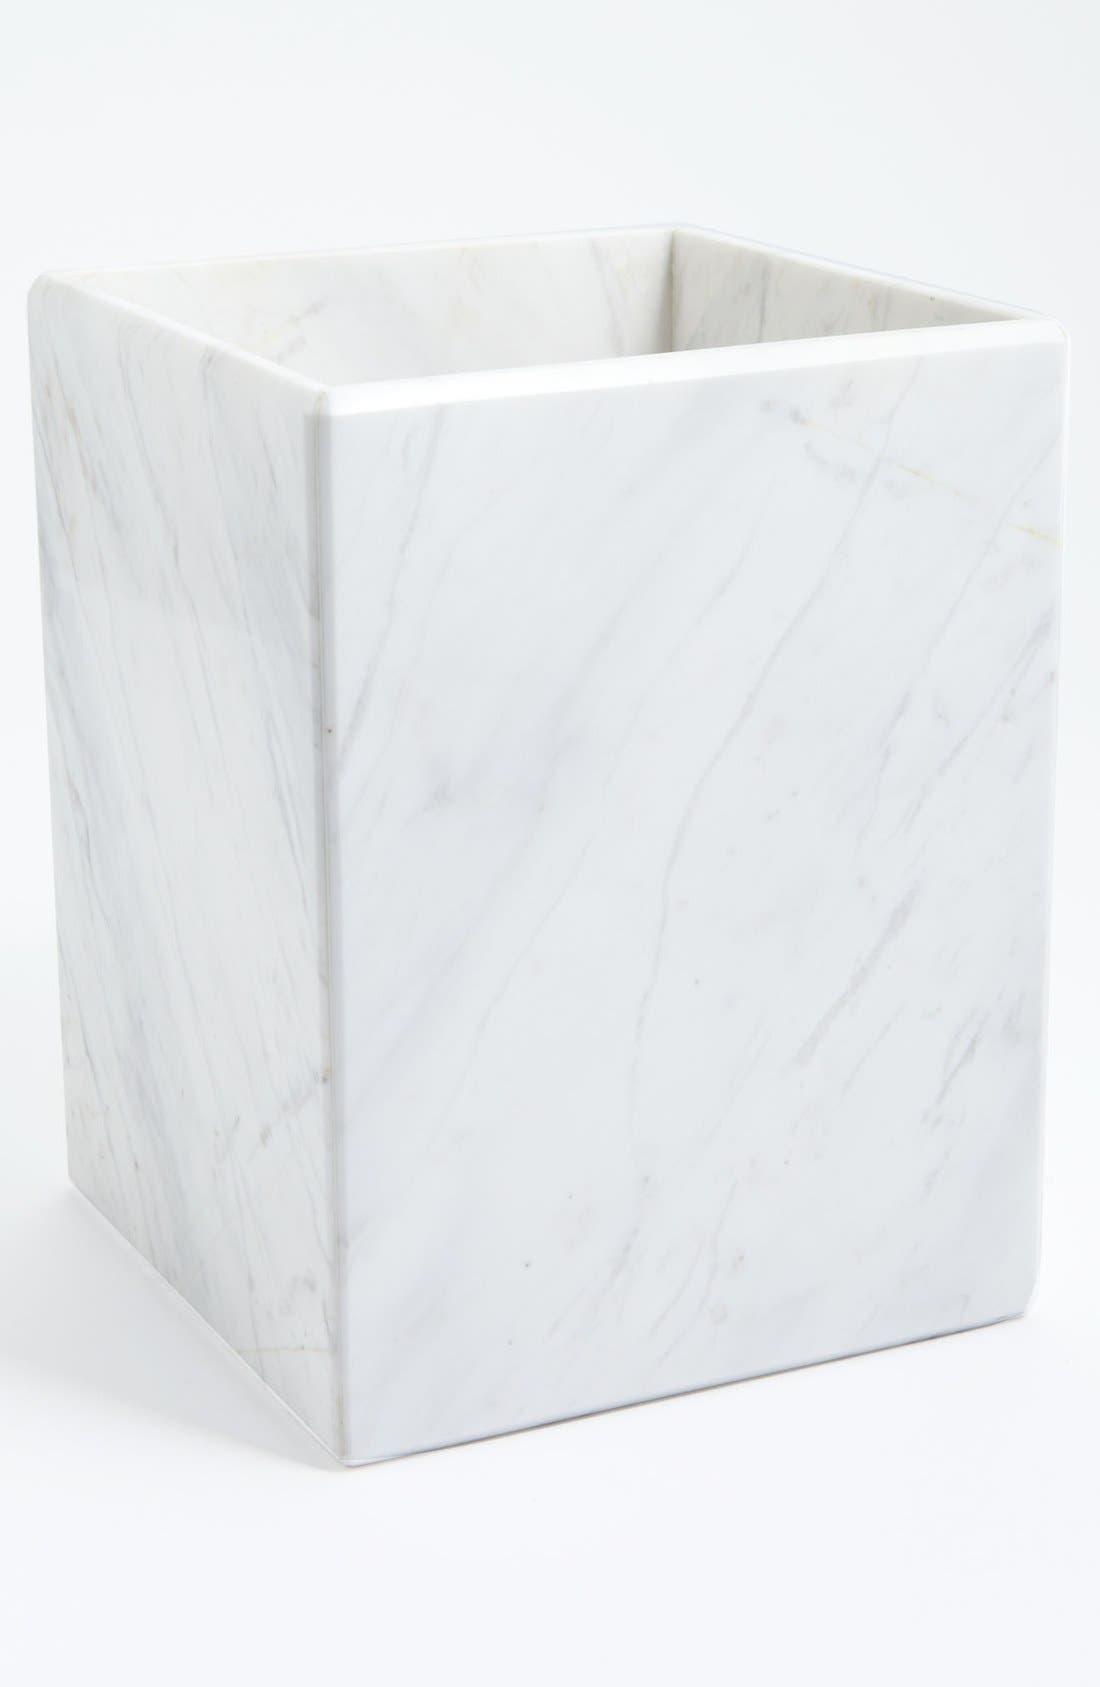 Main Image - Waterworks Studio 'Luna' White Marble Wastebasket (Online Only)